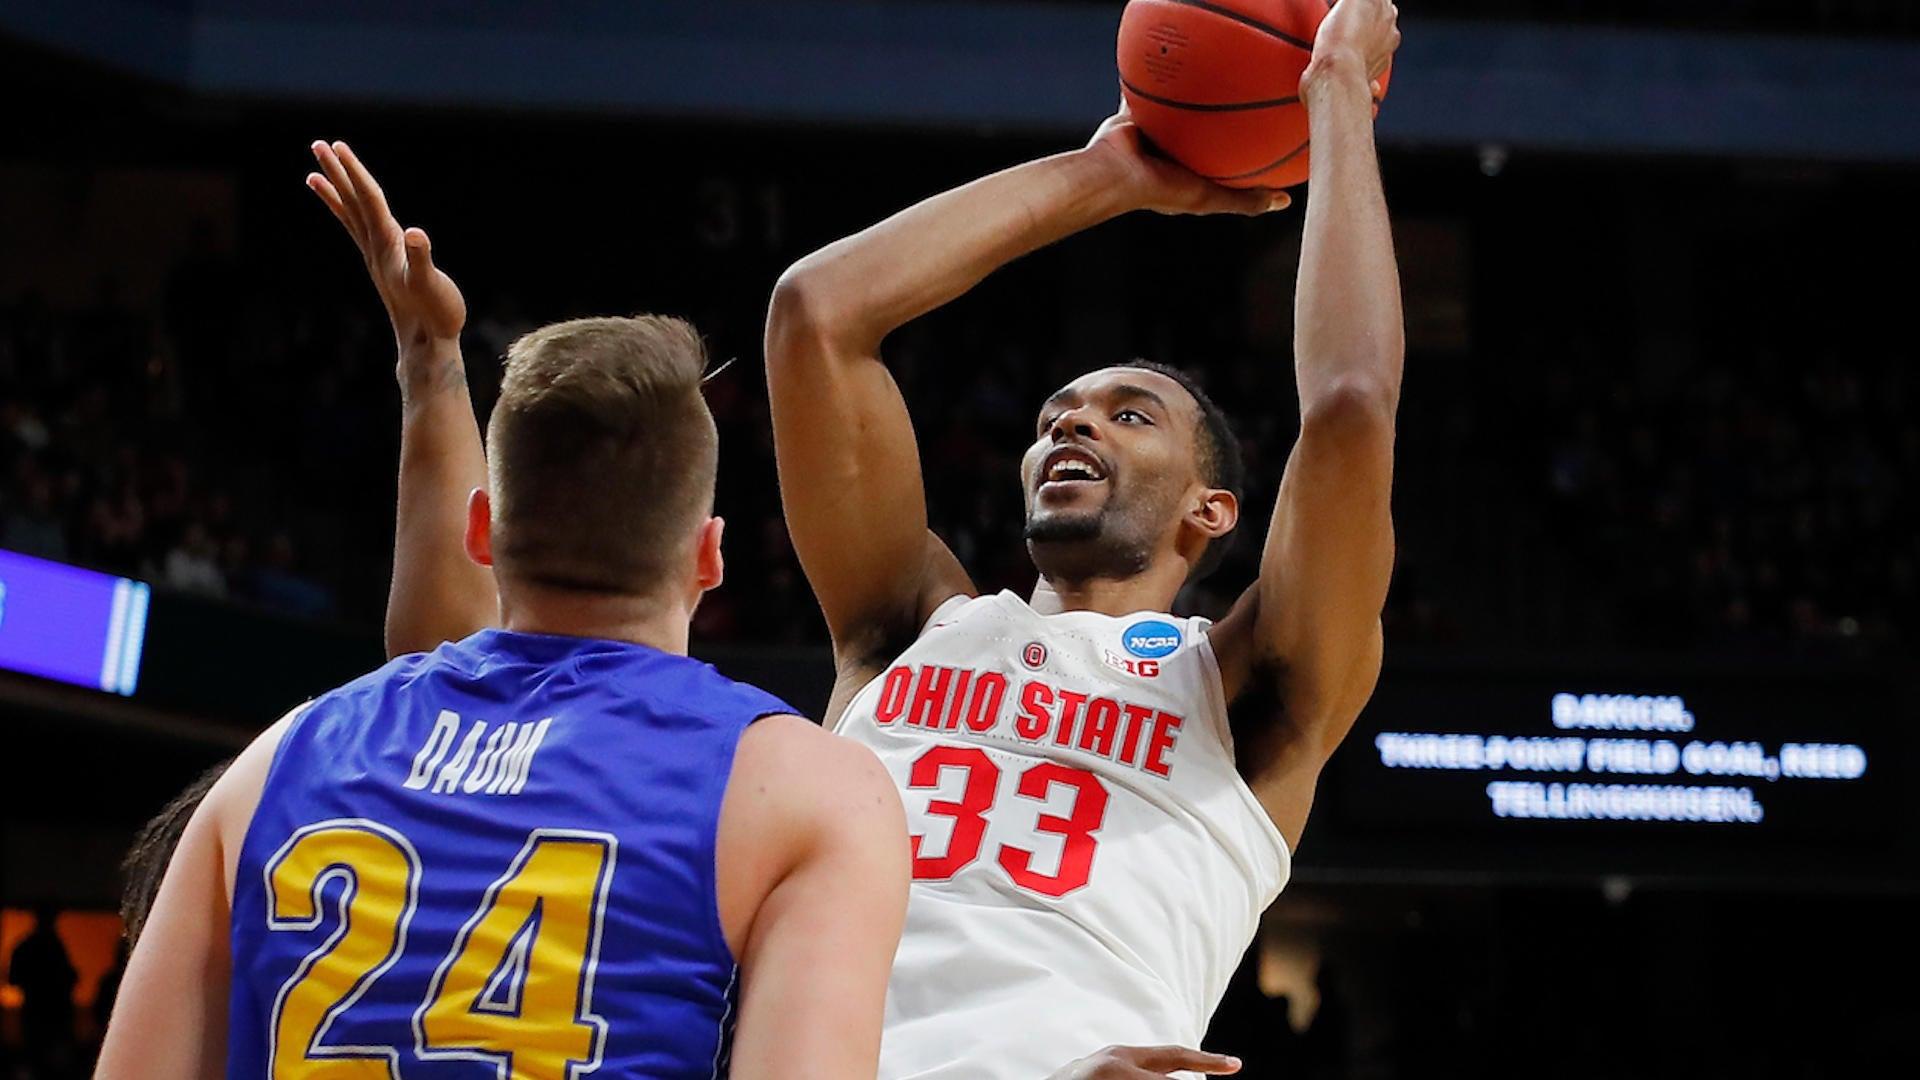 WATCH: No. 5 Ohio State edges out No. 12 South Dakota State, 81-73 - CBSSports.com